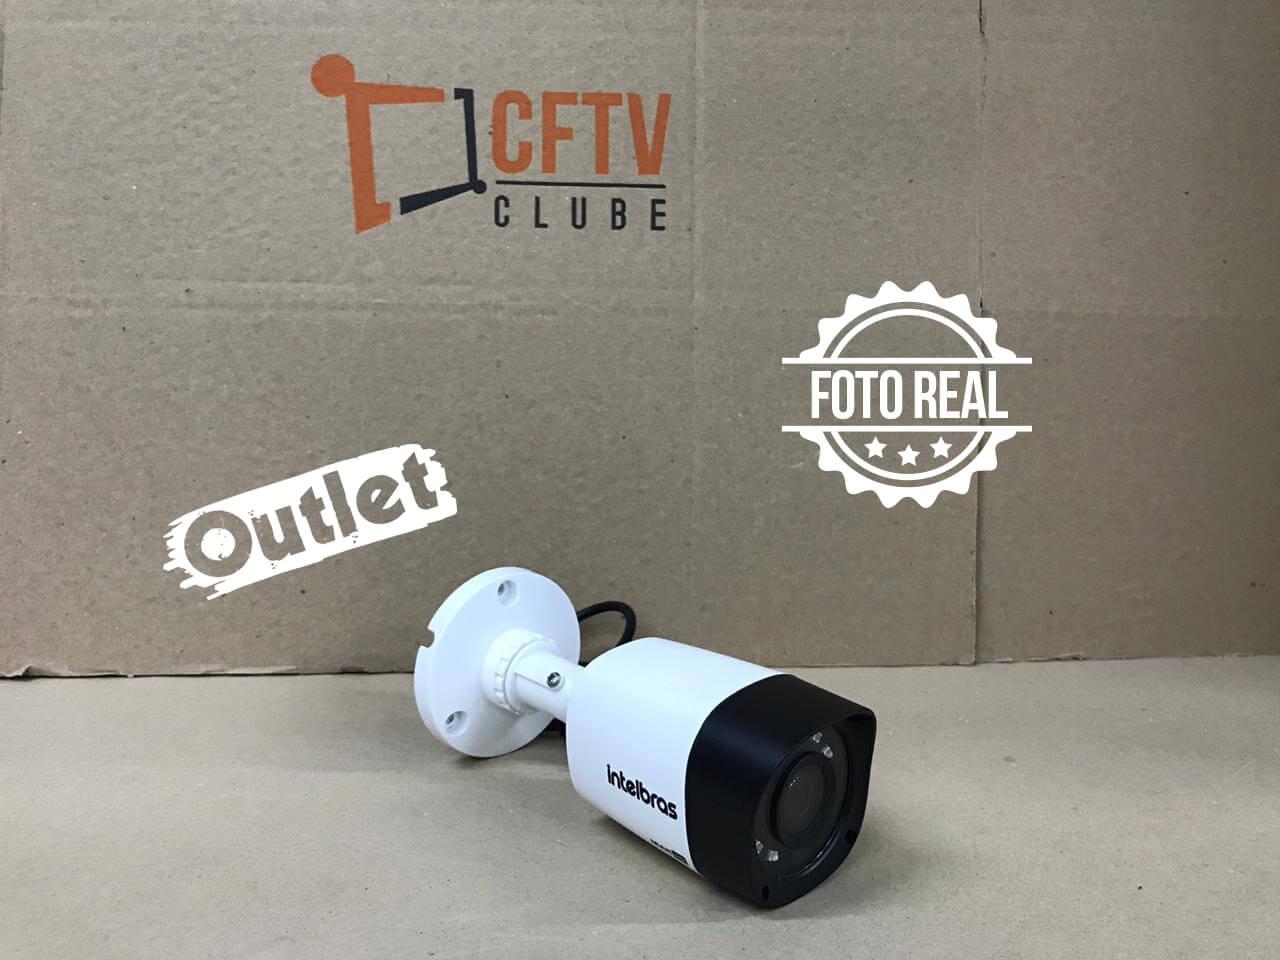 Outlet - Câmera Intelbras Bullet HD VHD 1120 B Multi HD G4 (1.0MP   720p   2.6mm   Plast)  - CFTV Clube   Brasil